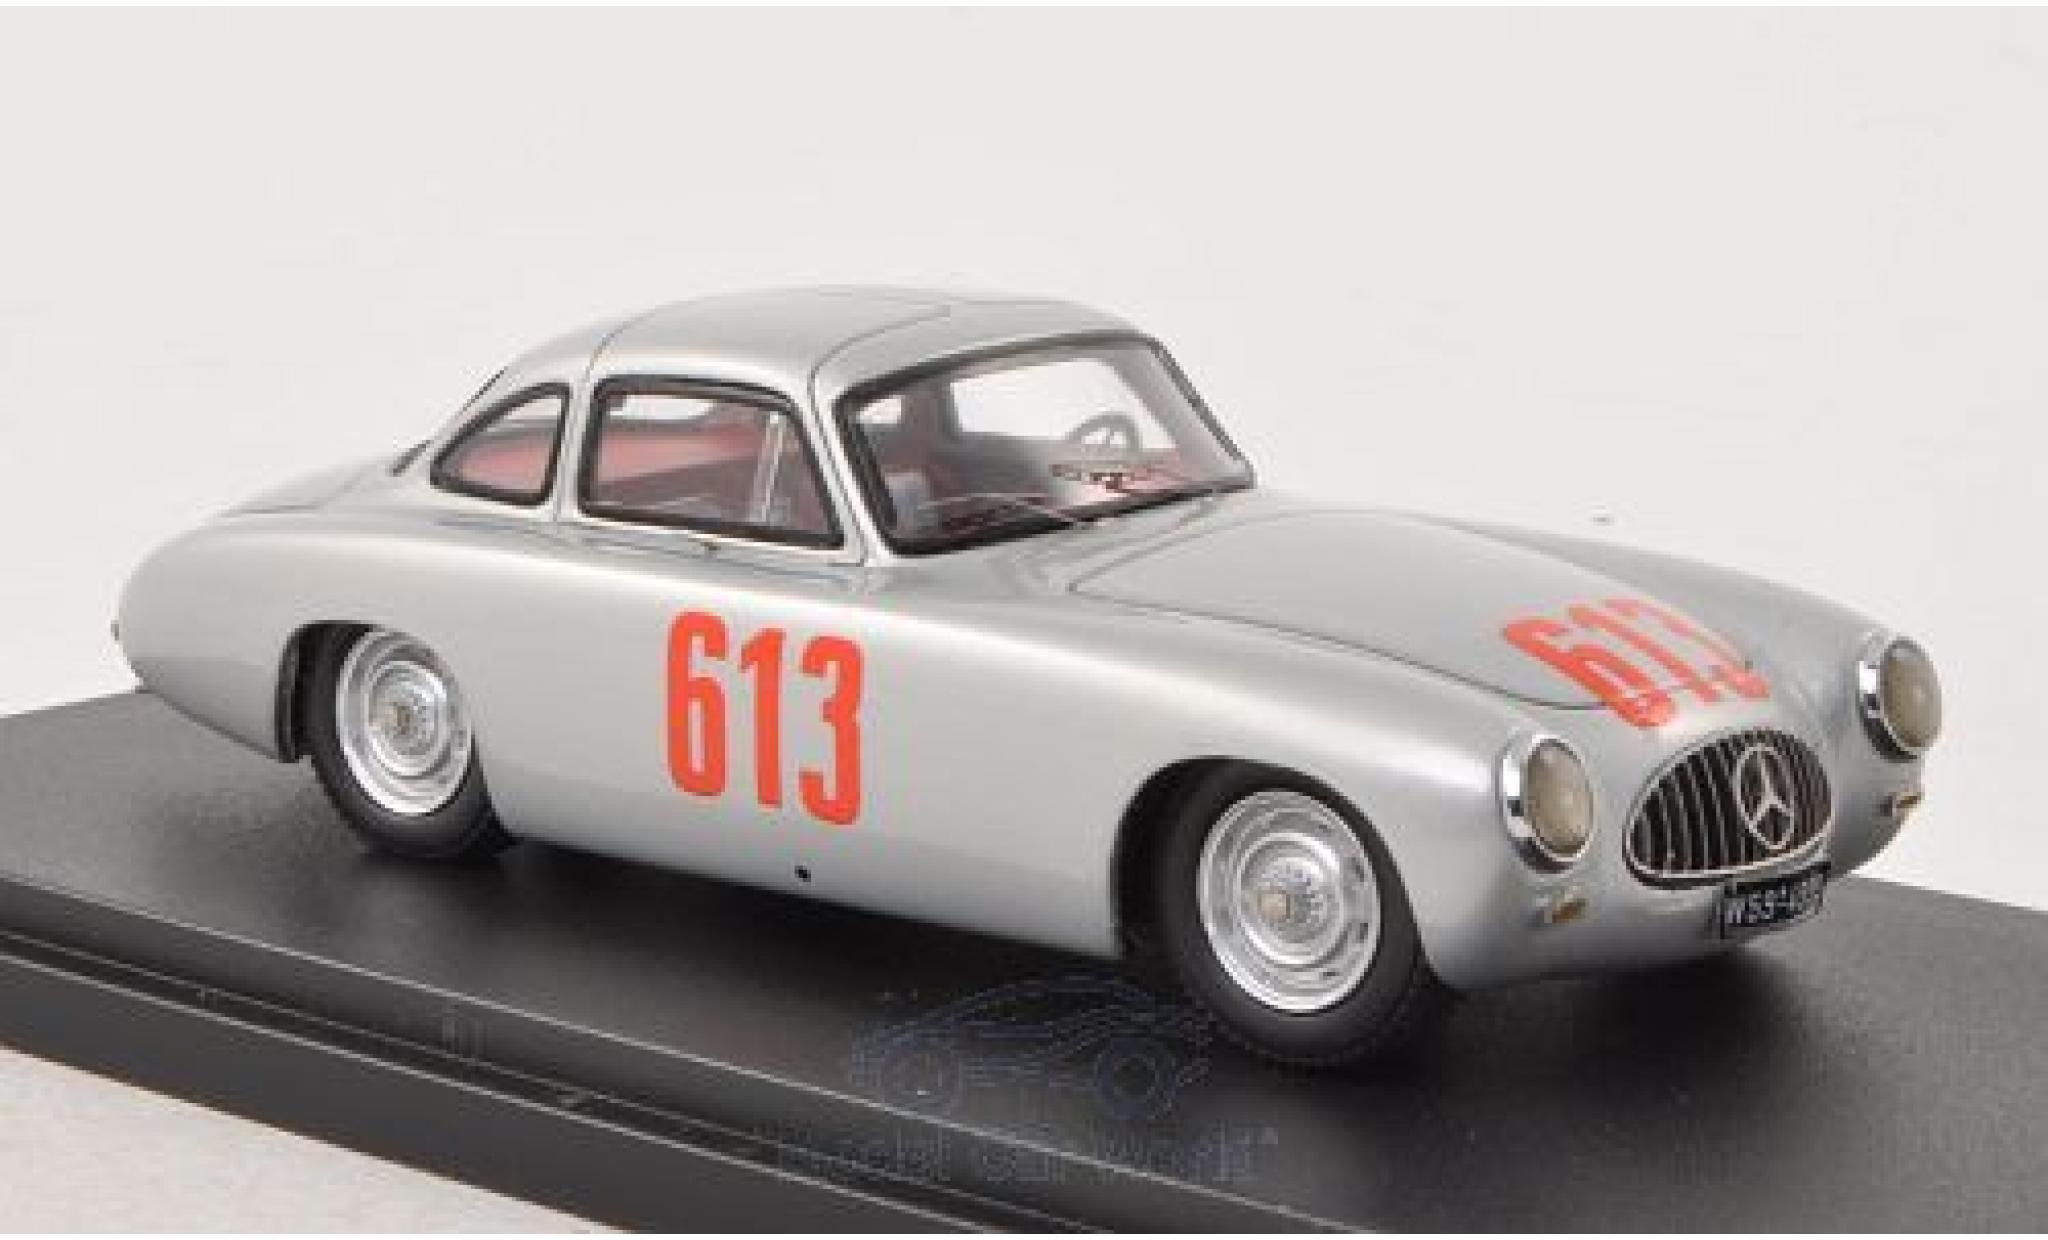 Mercedes 300 SL 1/43 Contact No.613 Mille Miglia 1952